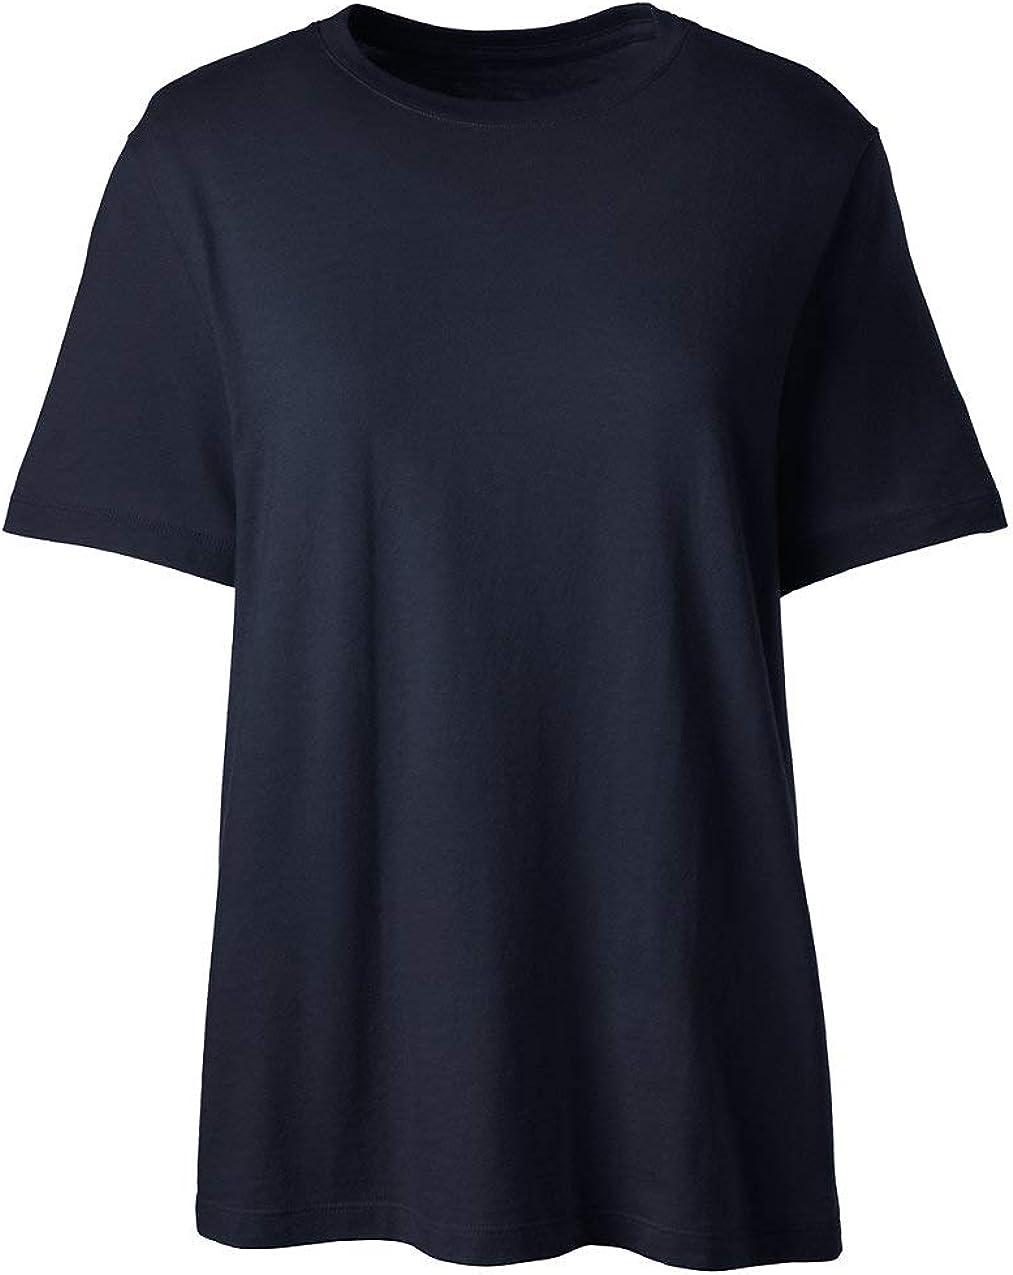 Lands' End School Uniform Women's Short Sleeve Feminine Fit Essential T-Shirt